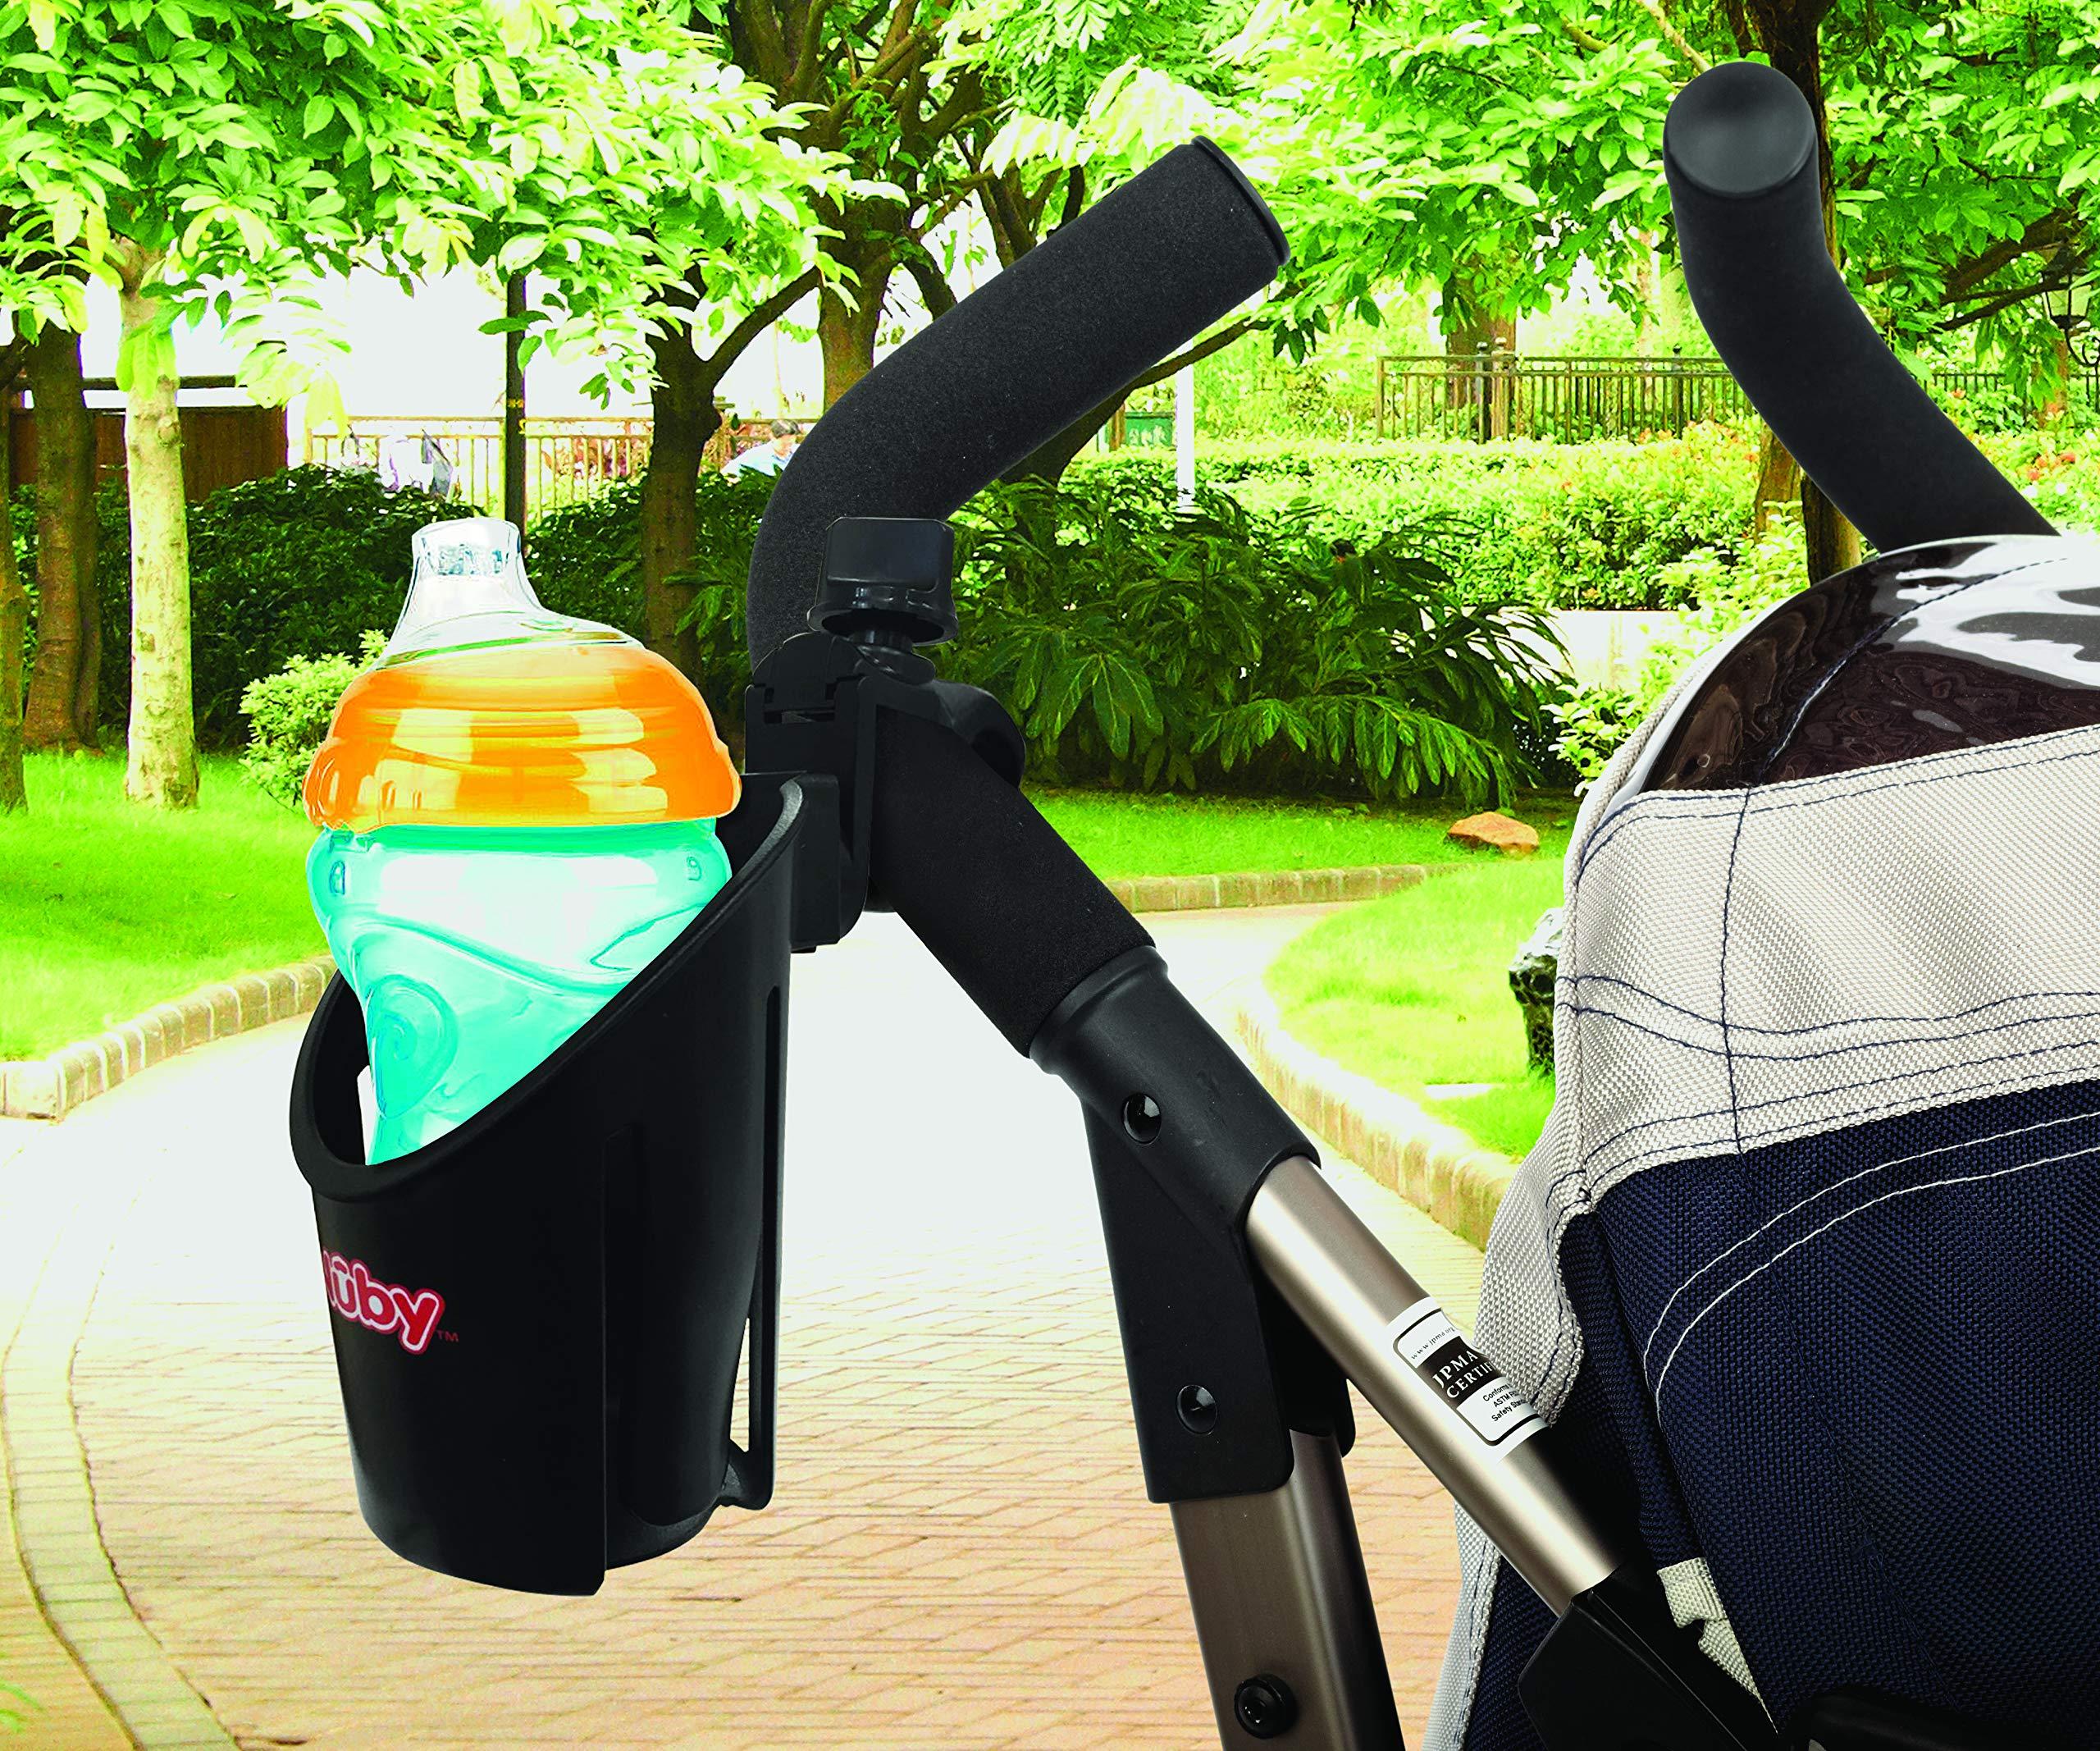 Nuby Trio Stroller Accessory Set: Cup Holder/Phone Holder/Double Hook Set